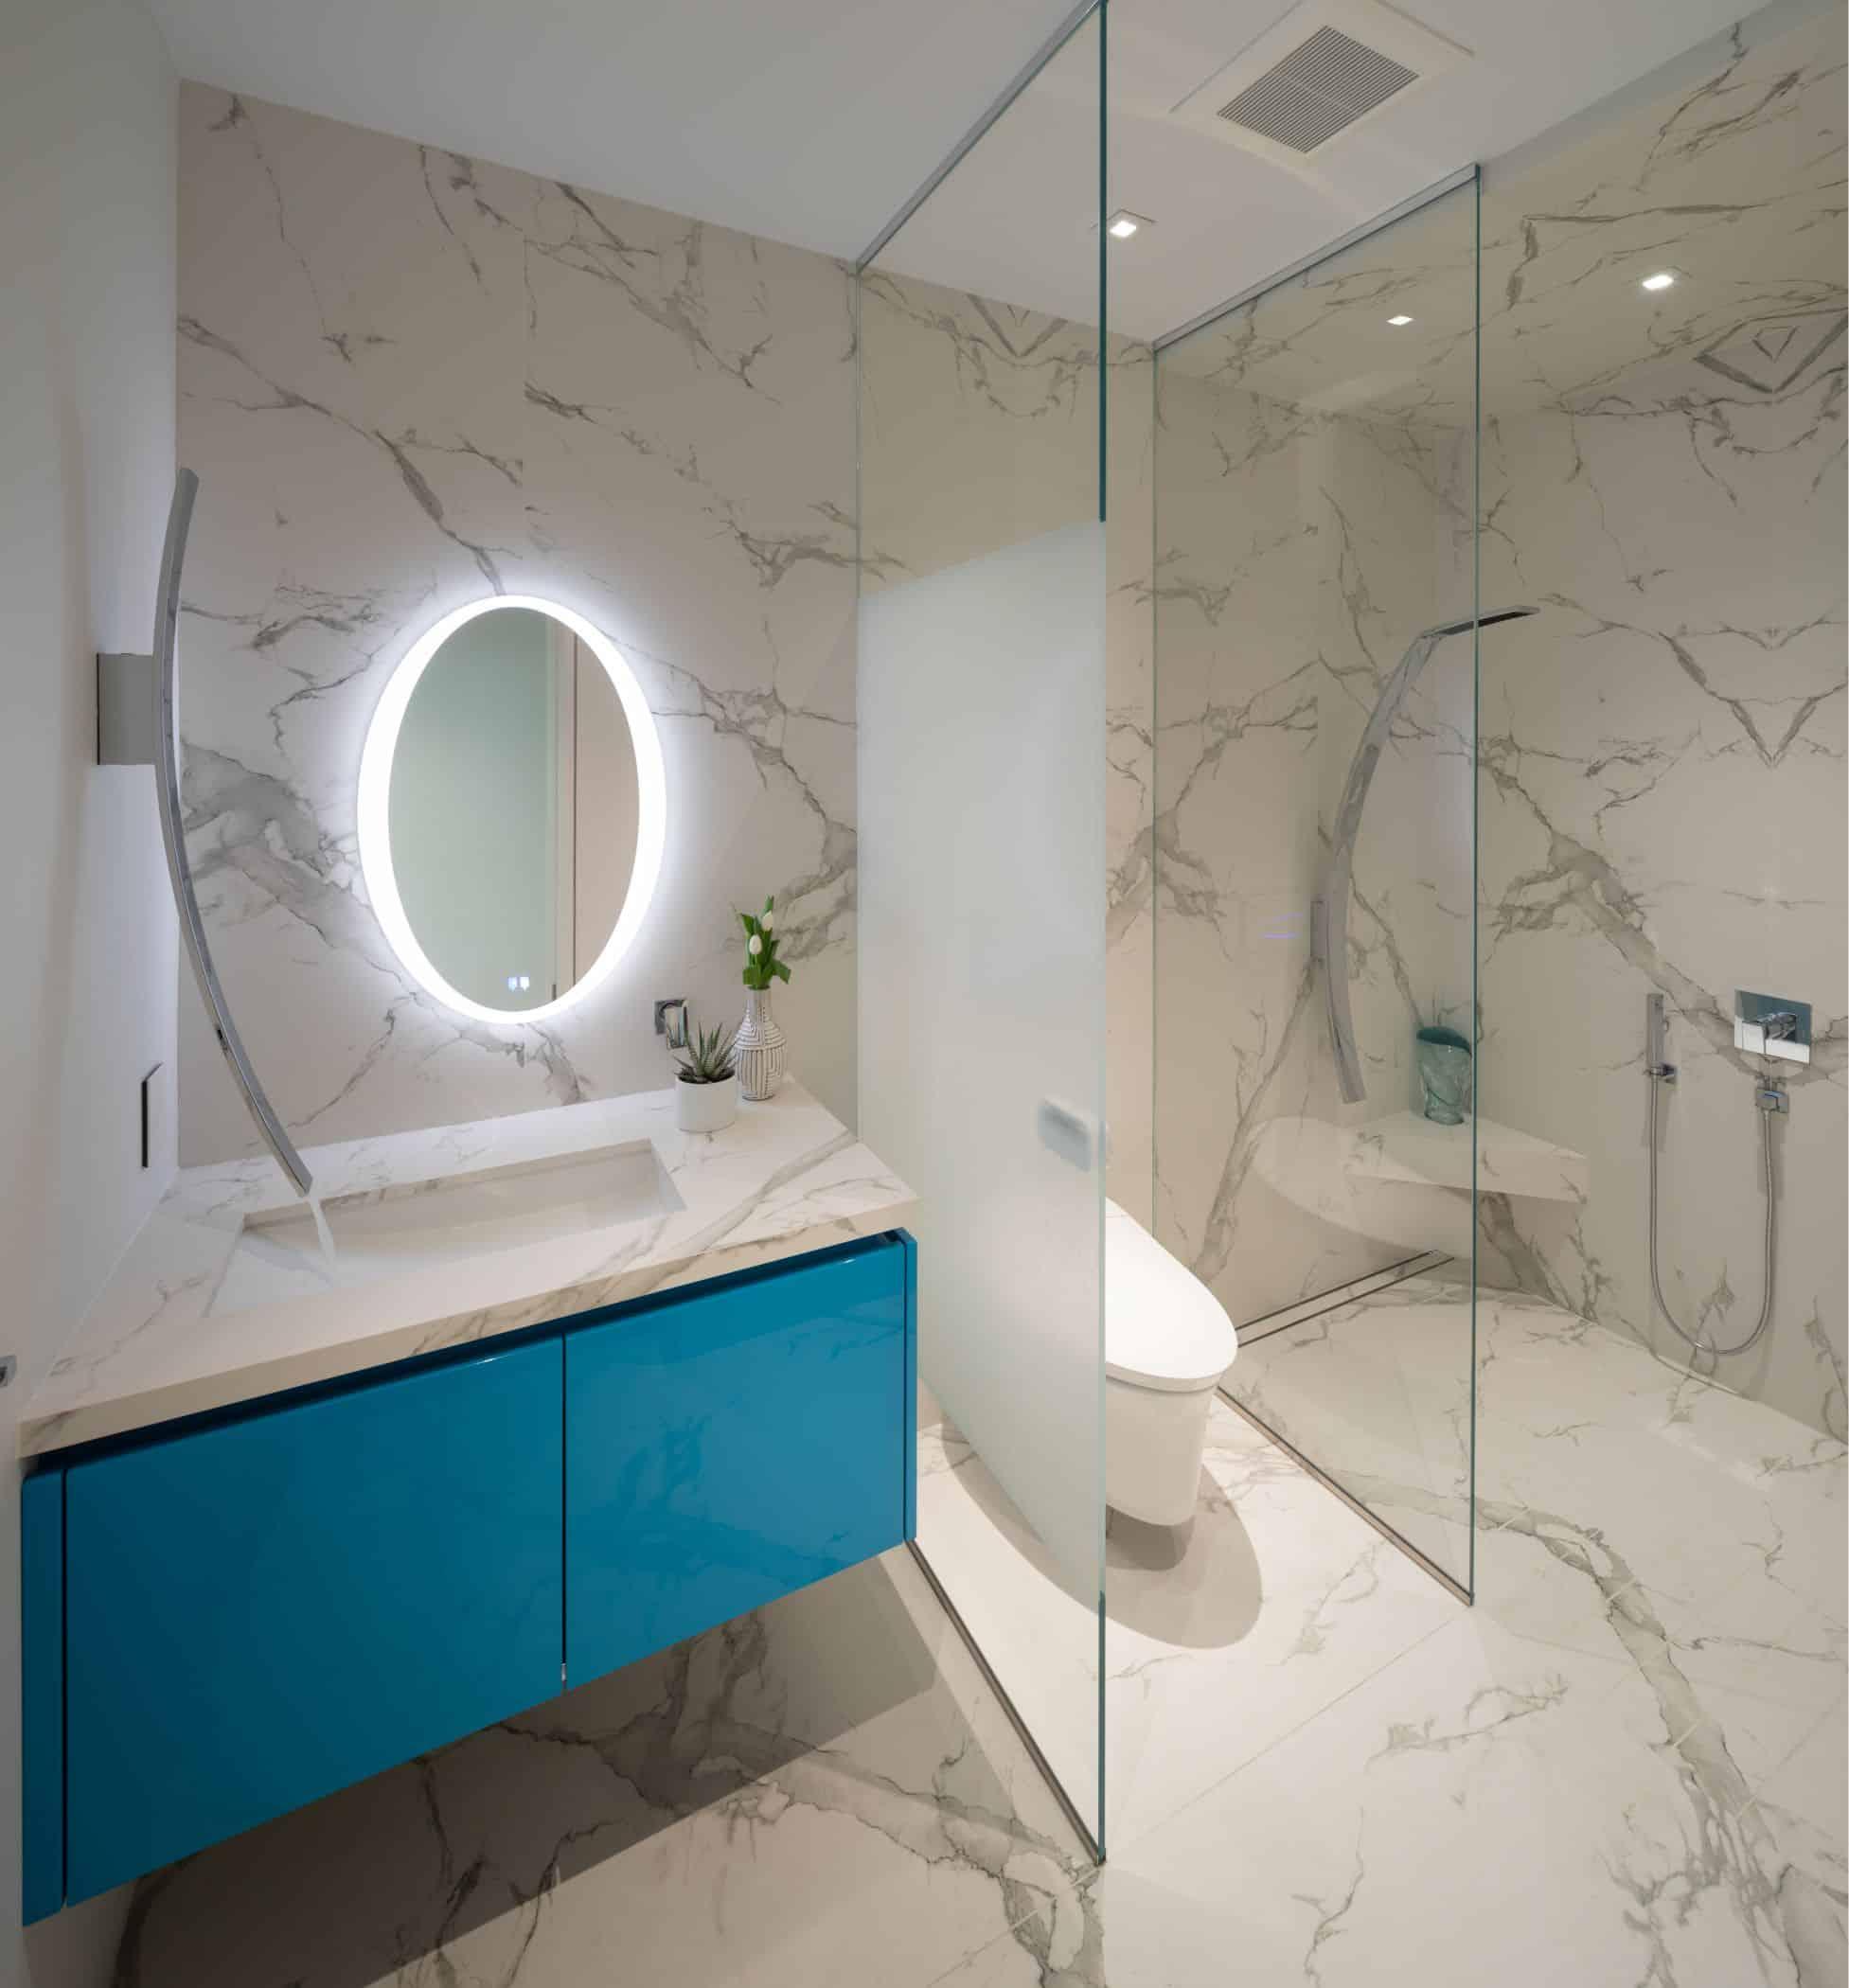 pool bathroom features a custom retro aqua porsche blue on the eggersmann vanity